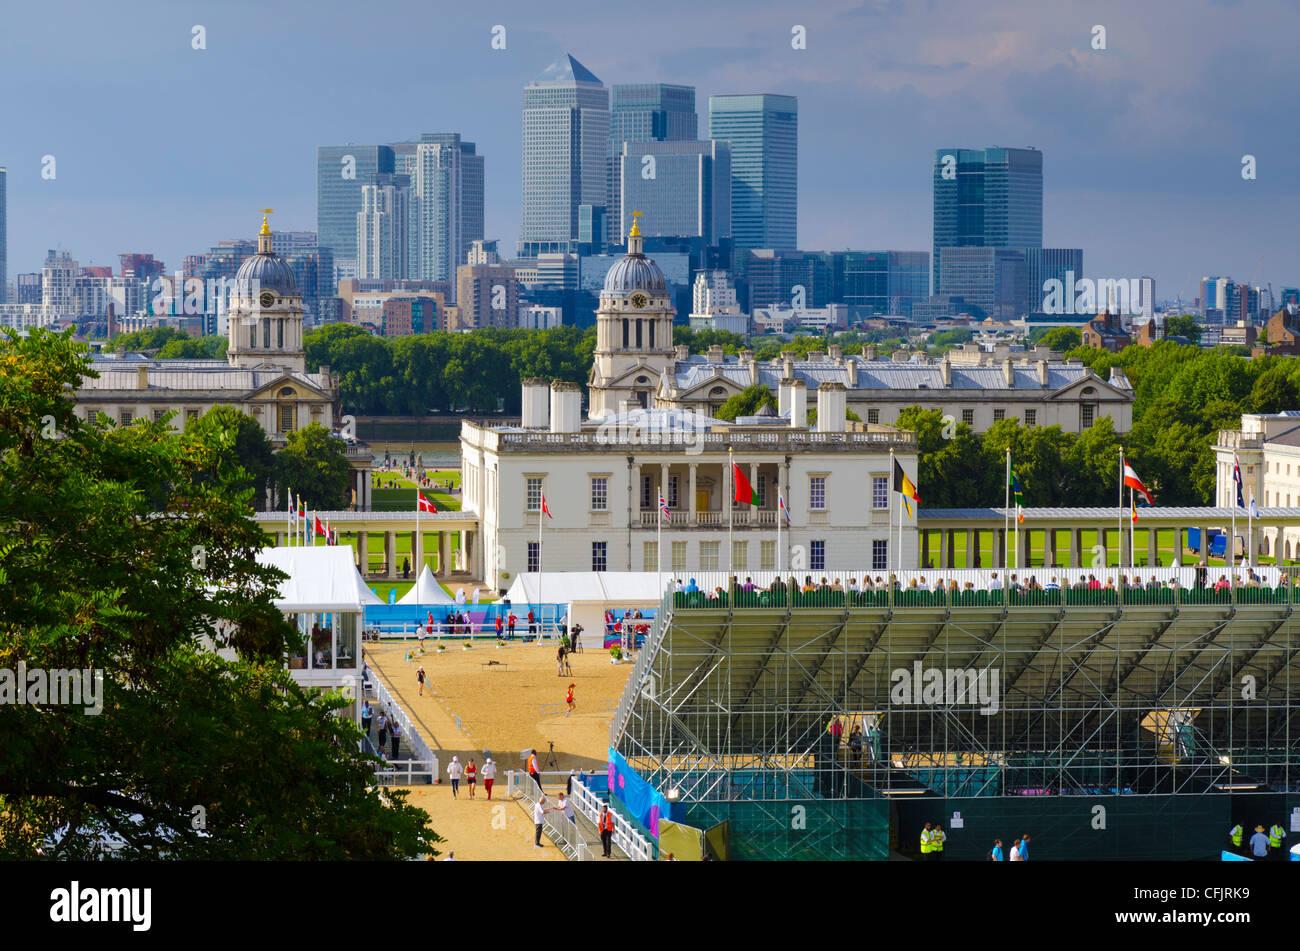 Greenwich Park, Canary Wharf, London, England, United Kingdom, Europe - Stock Image